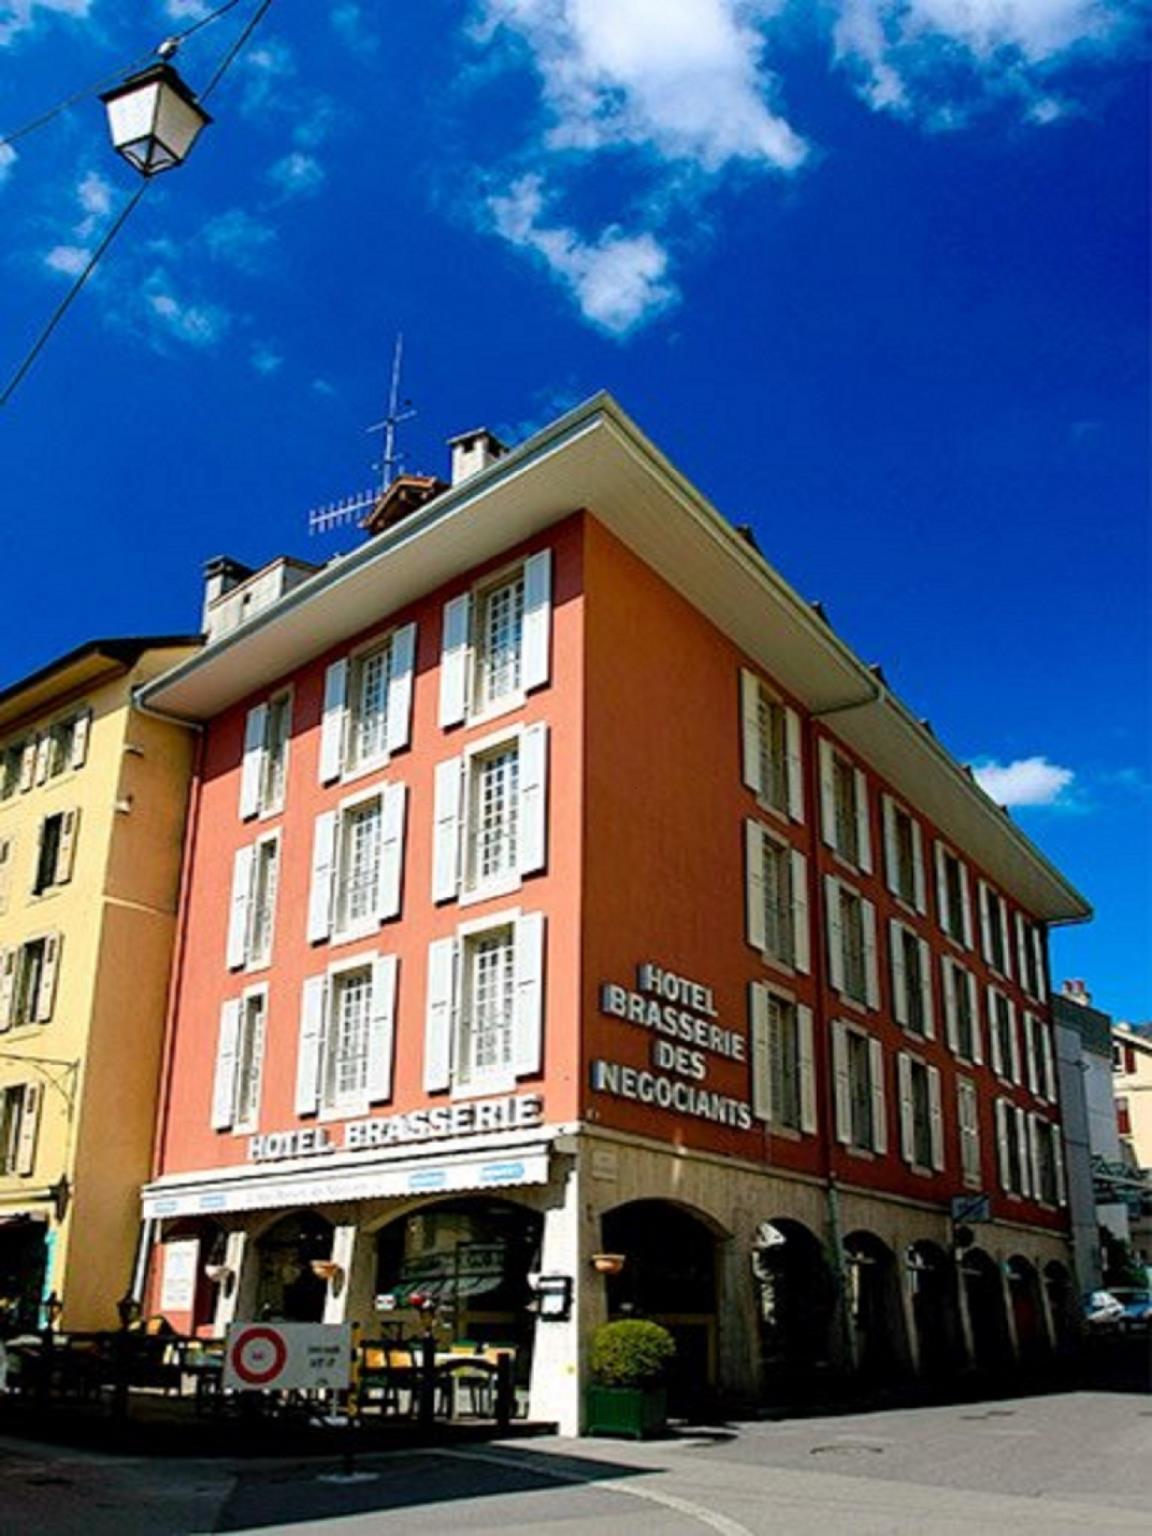 Hotel Restaurant Les Negociants, Pays-d'Enhaut